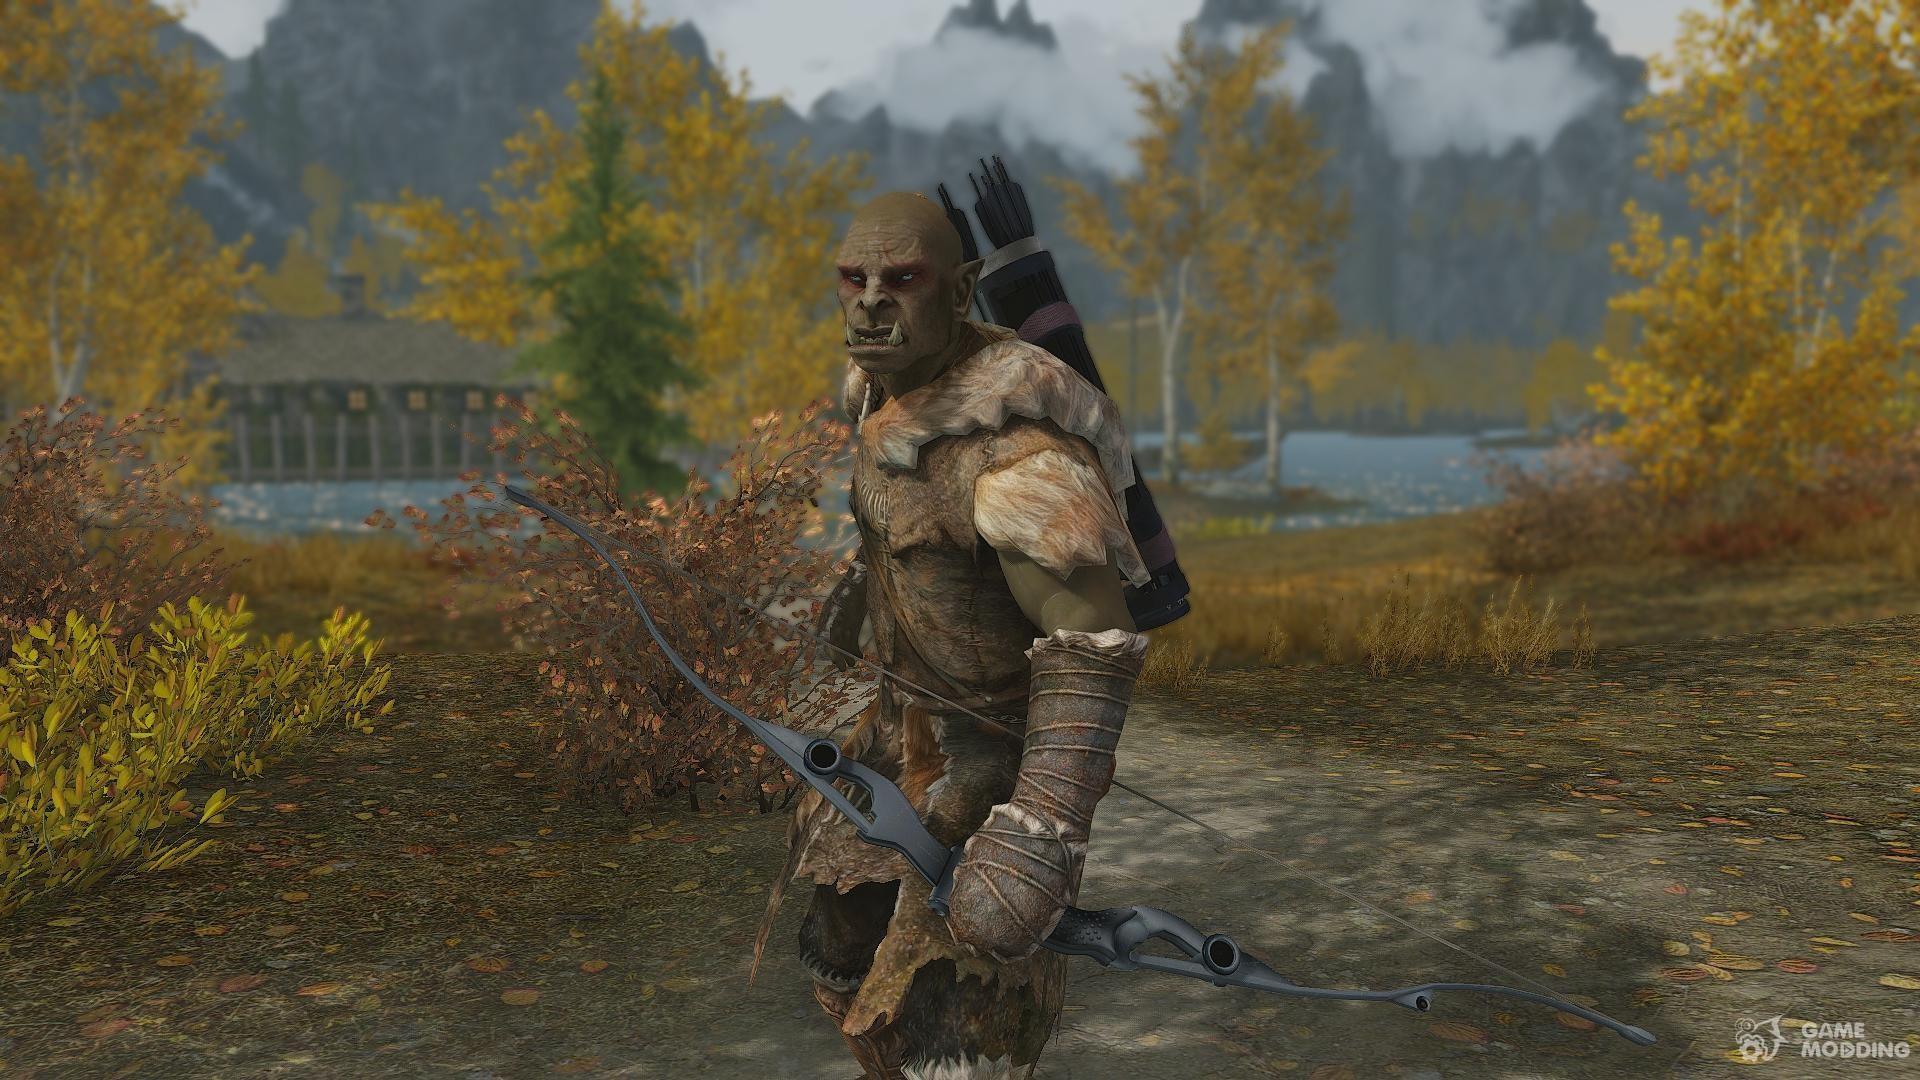 Skyrim Craft Iron Arrows Mod